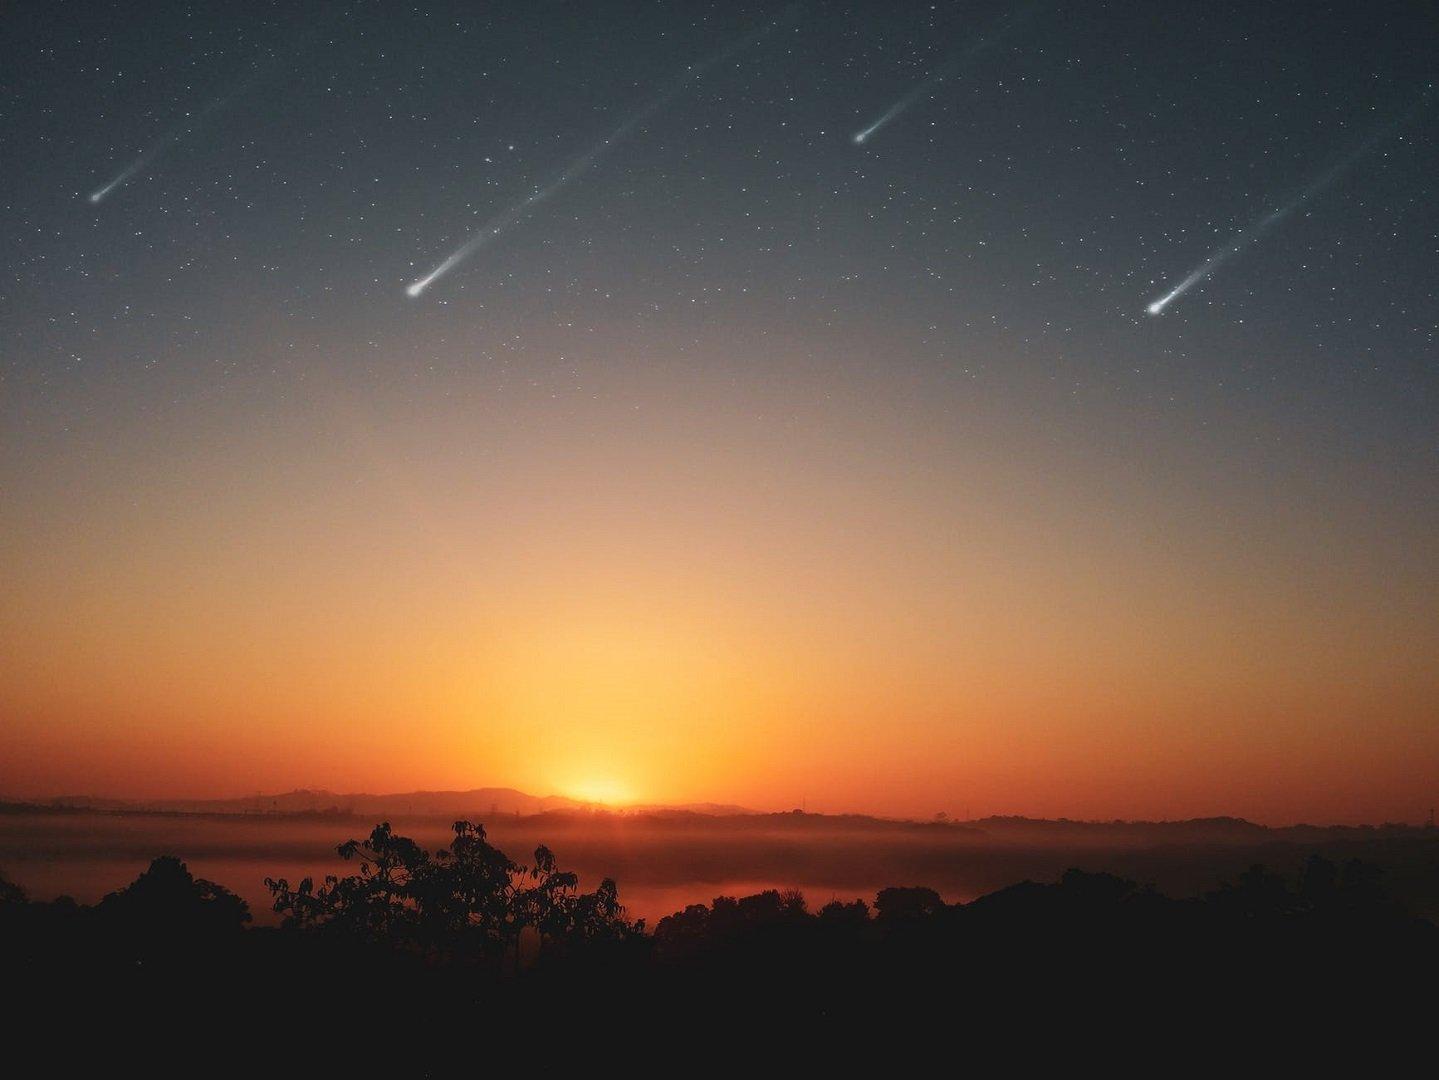 stelle cadenti tramonto